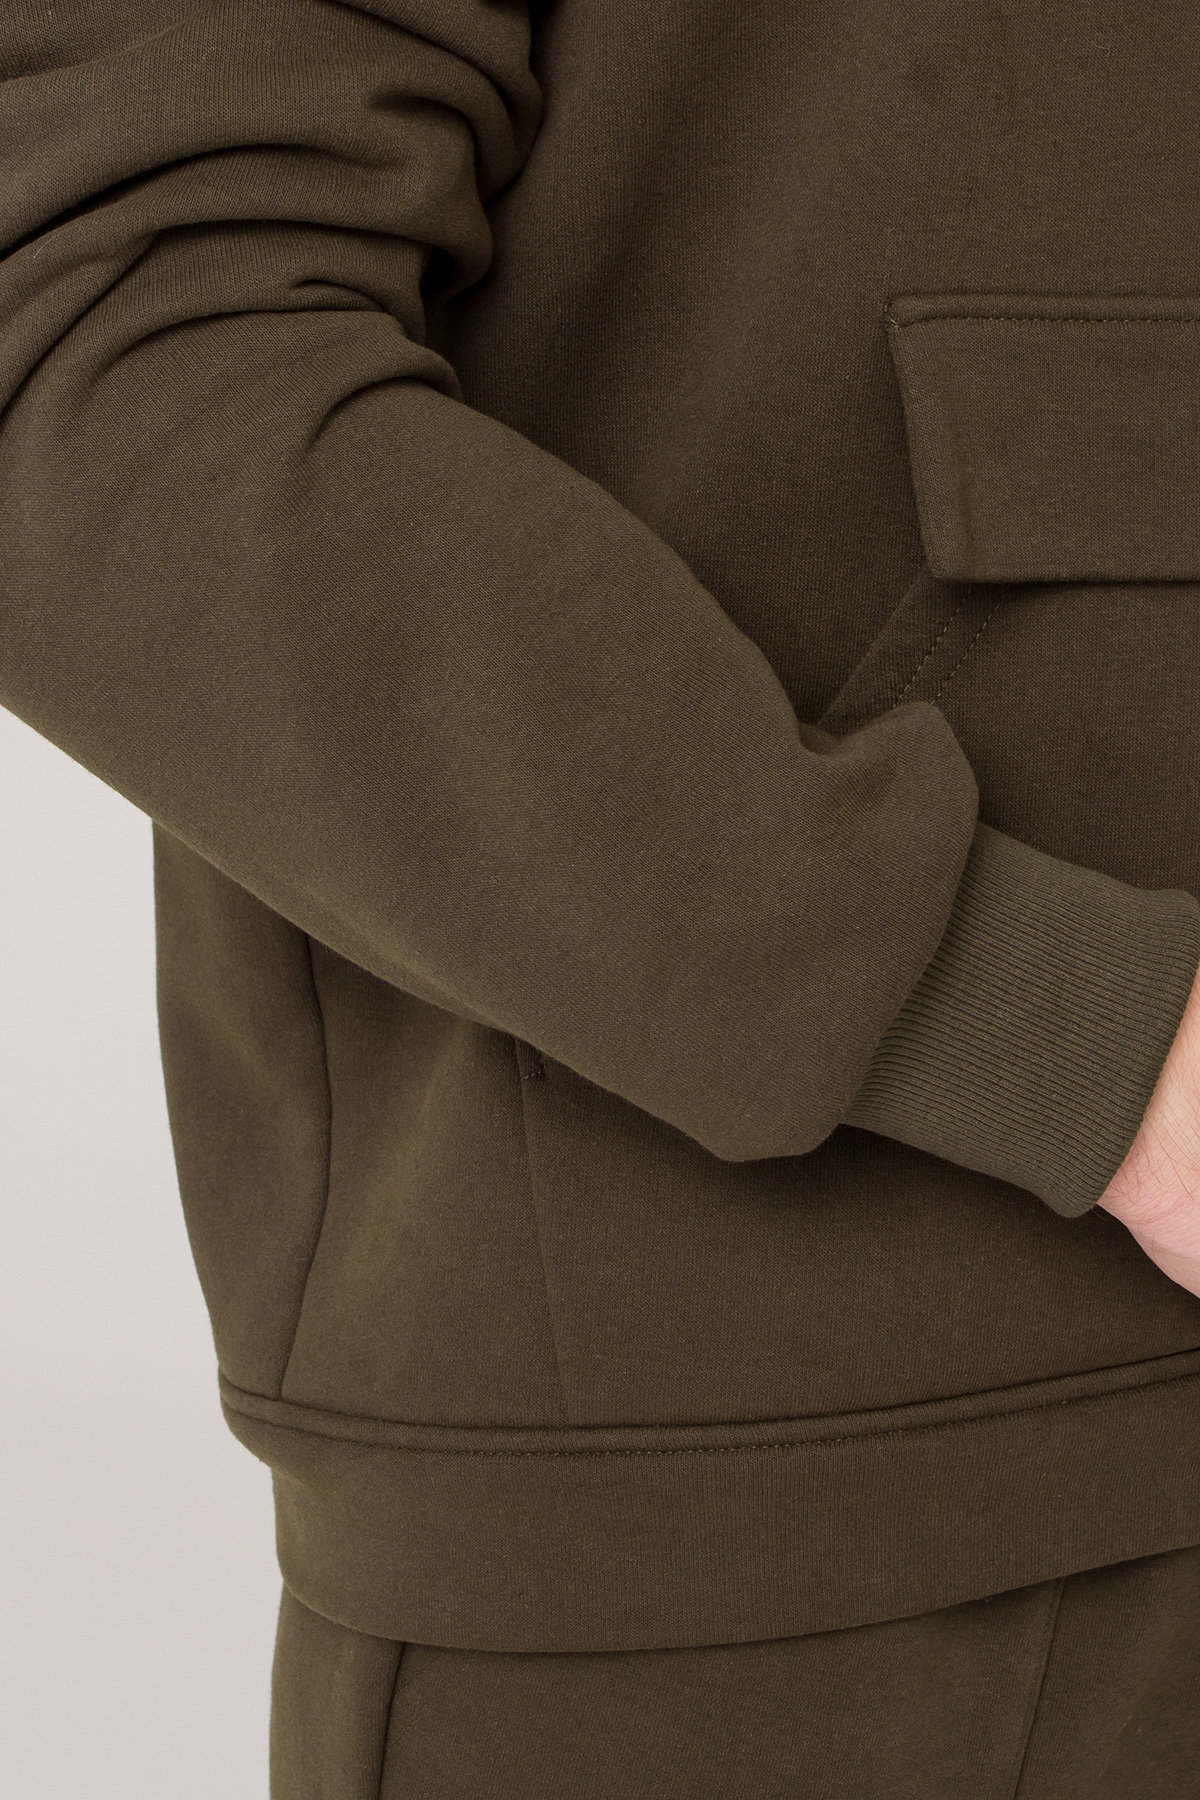 Хелс трикотаж 3х нитка с начесом прогулочный костюм 9990 KRISTATA АРТ. 46291 Цвет: Хаки - фото 1, интернет магазин tm-modus.ru